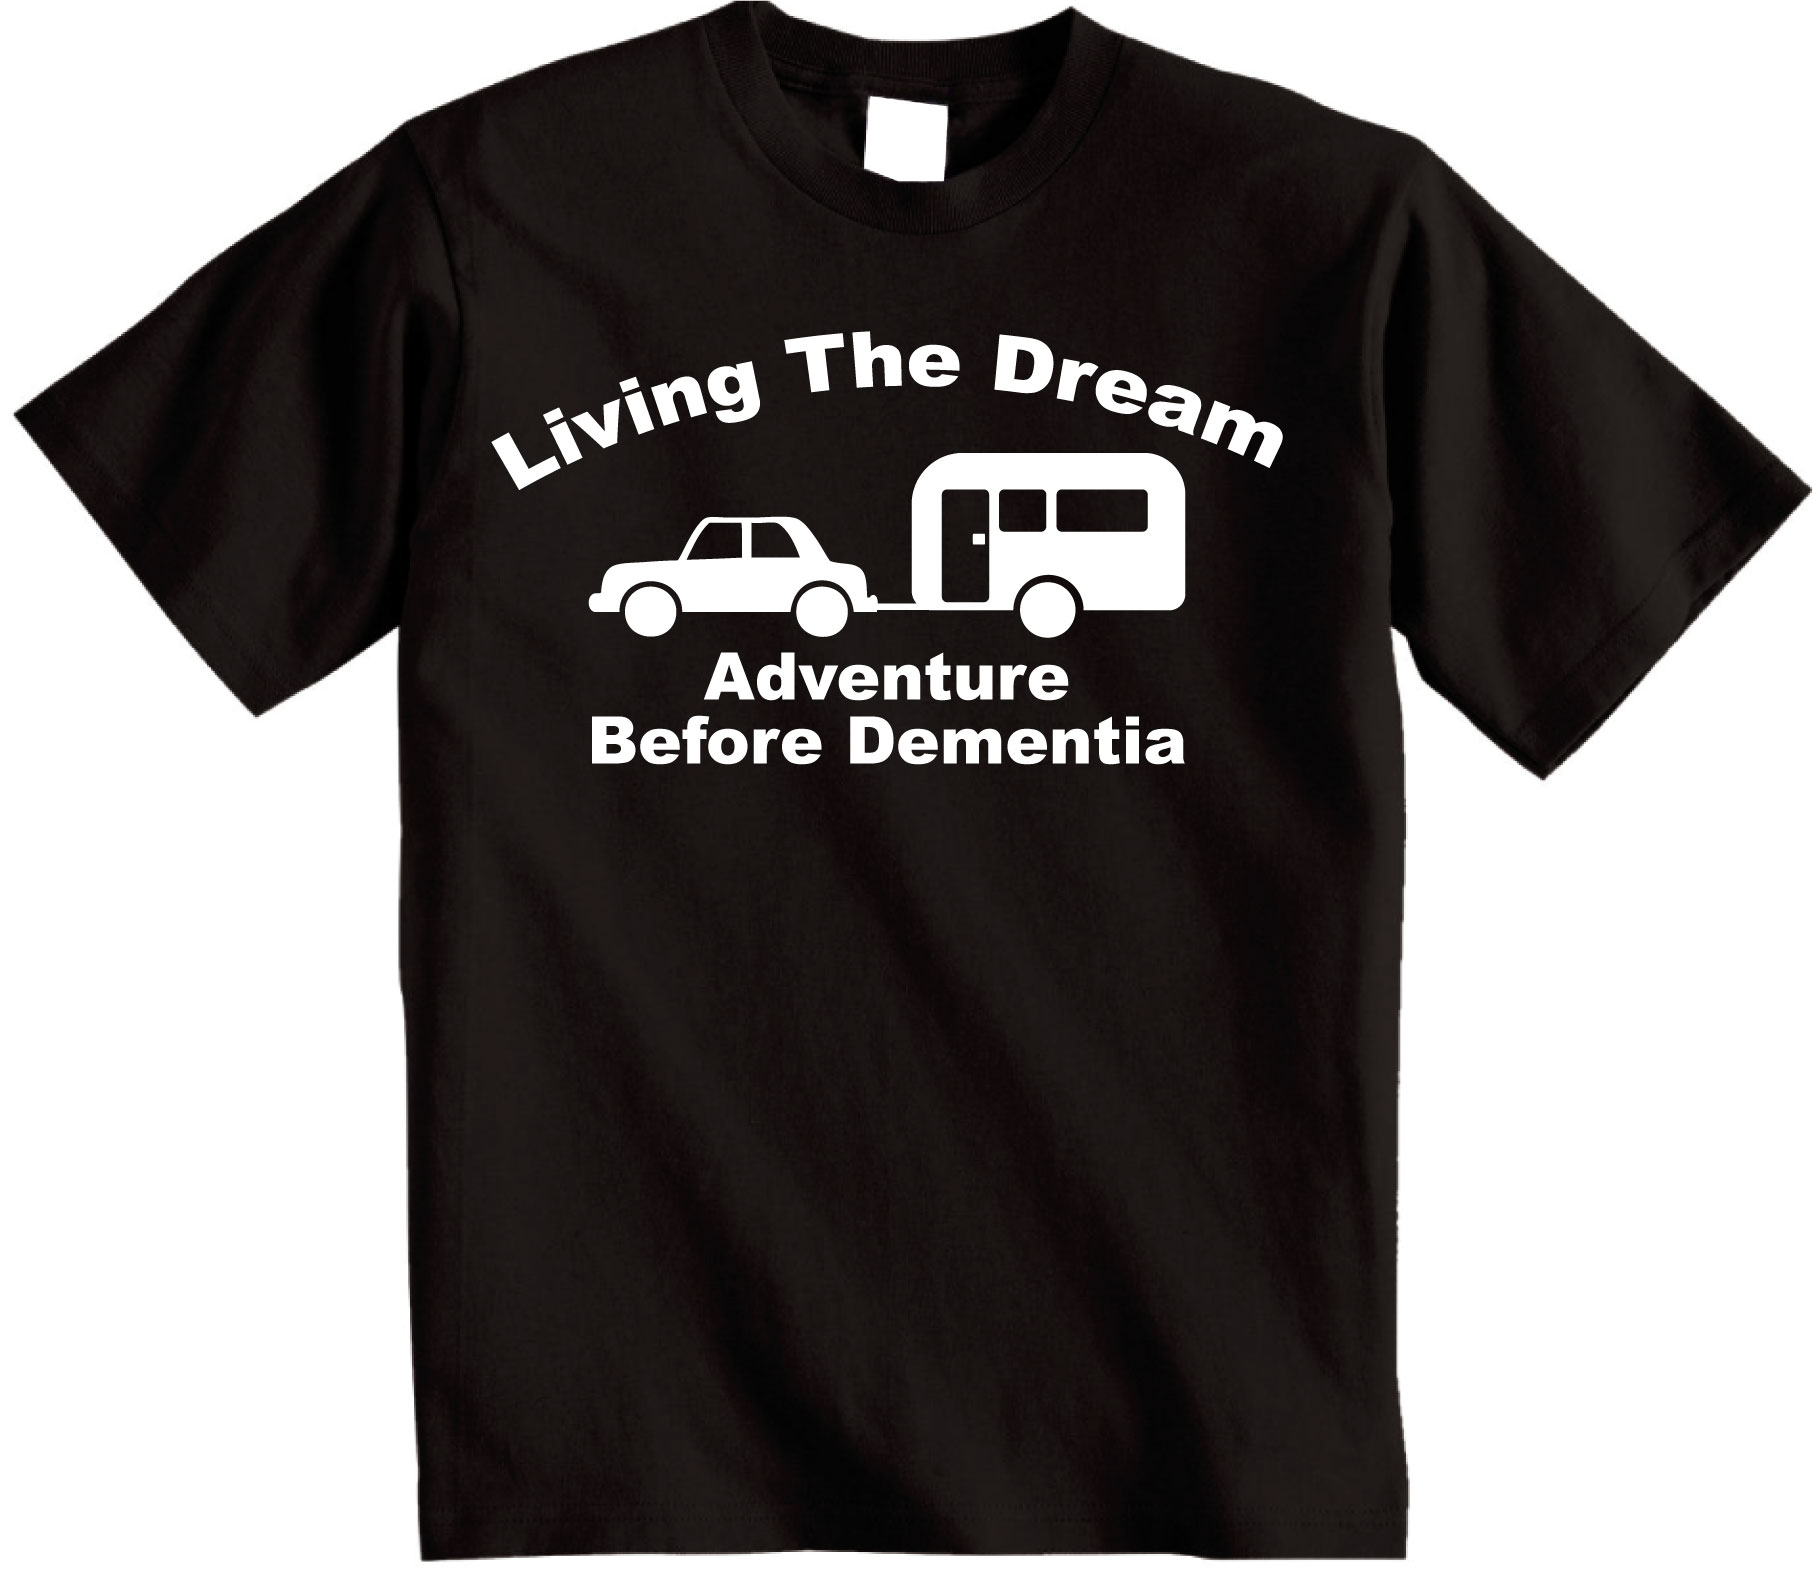 Living the Dream Adventure Before Dementia T-shirt